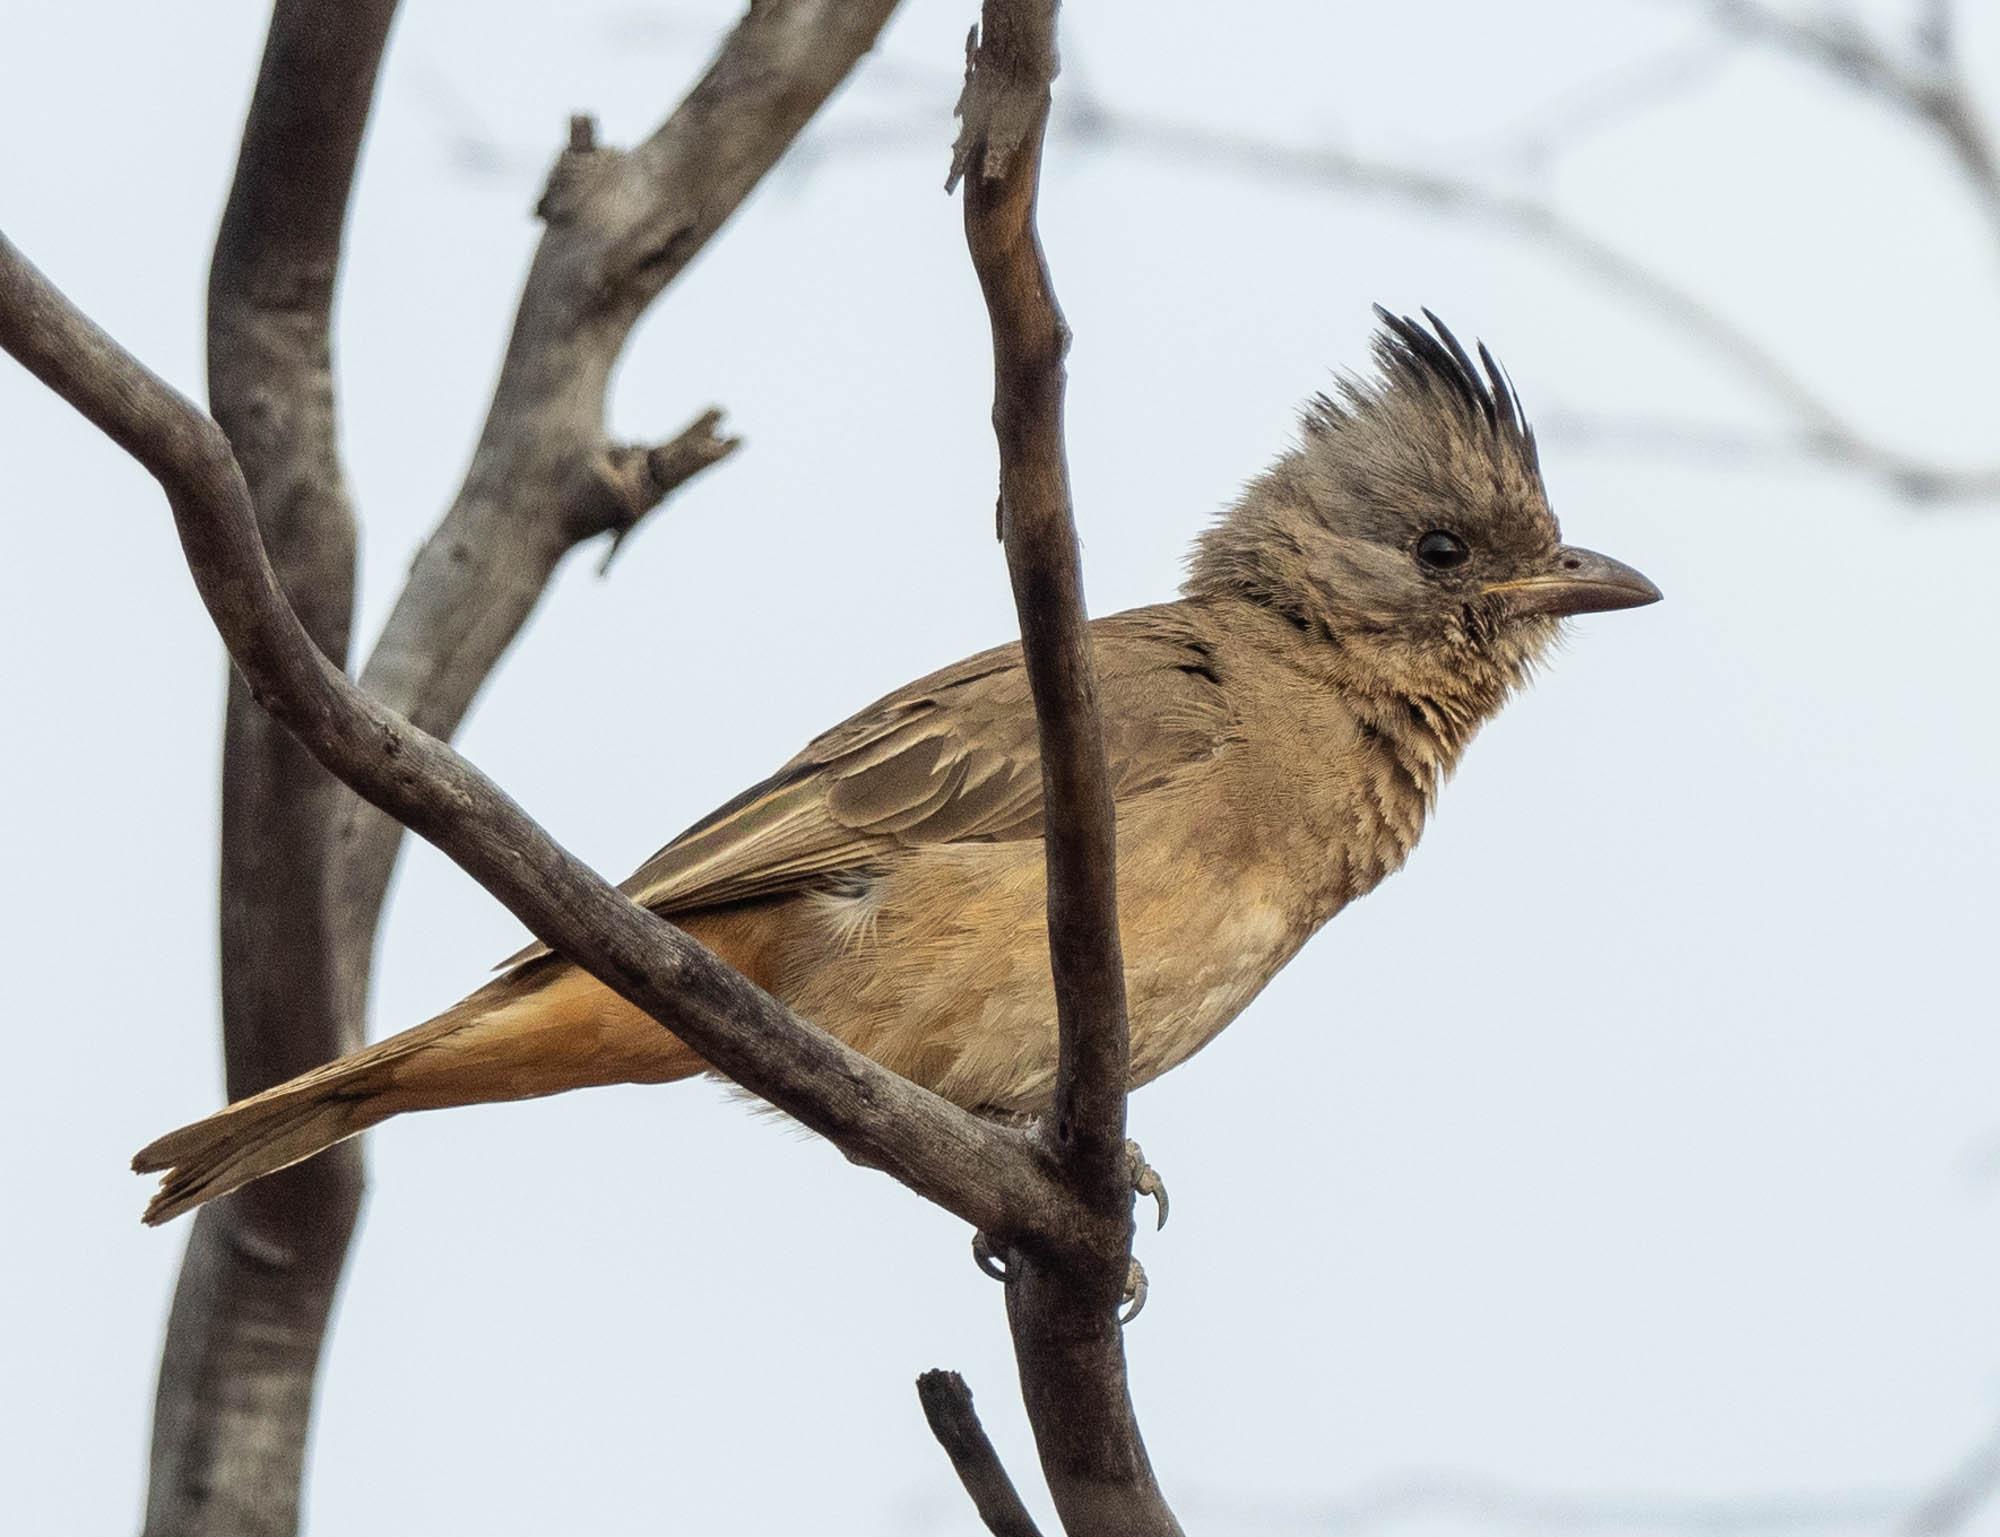 Crested Bellbird - juvenile